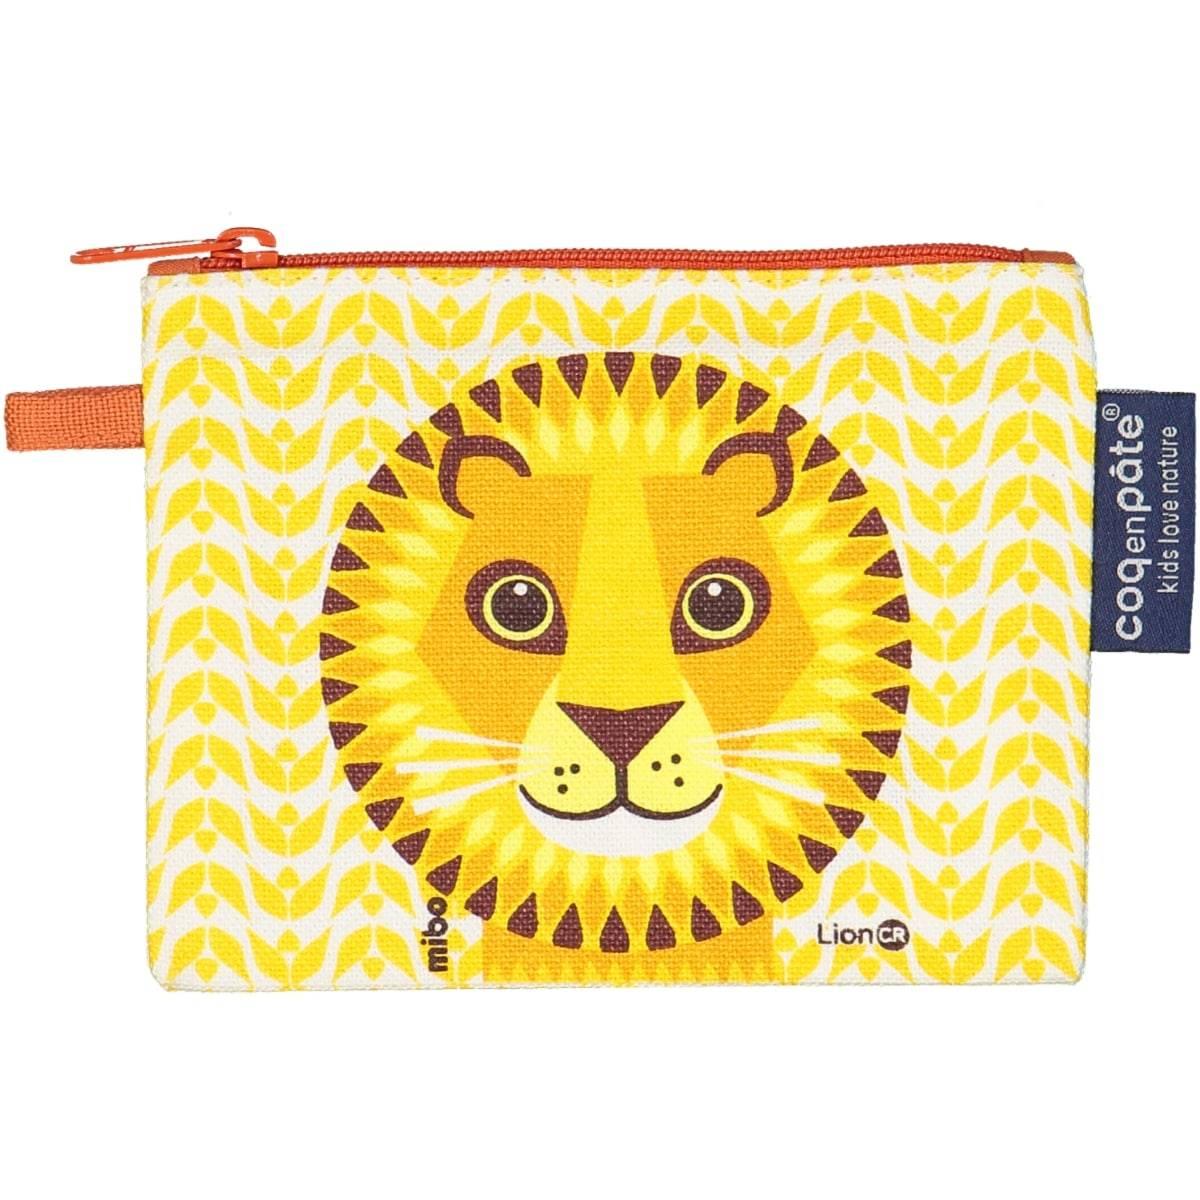 Coq en Pâte portemonnee Lion